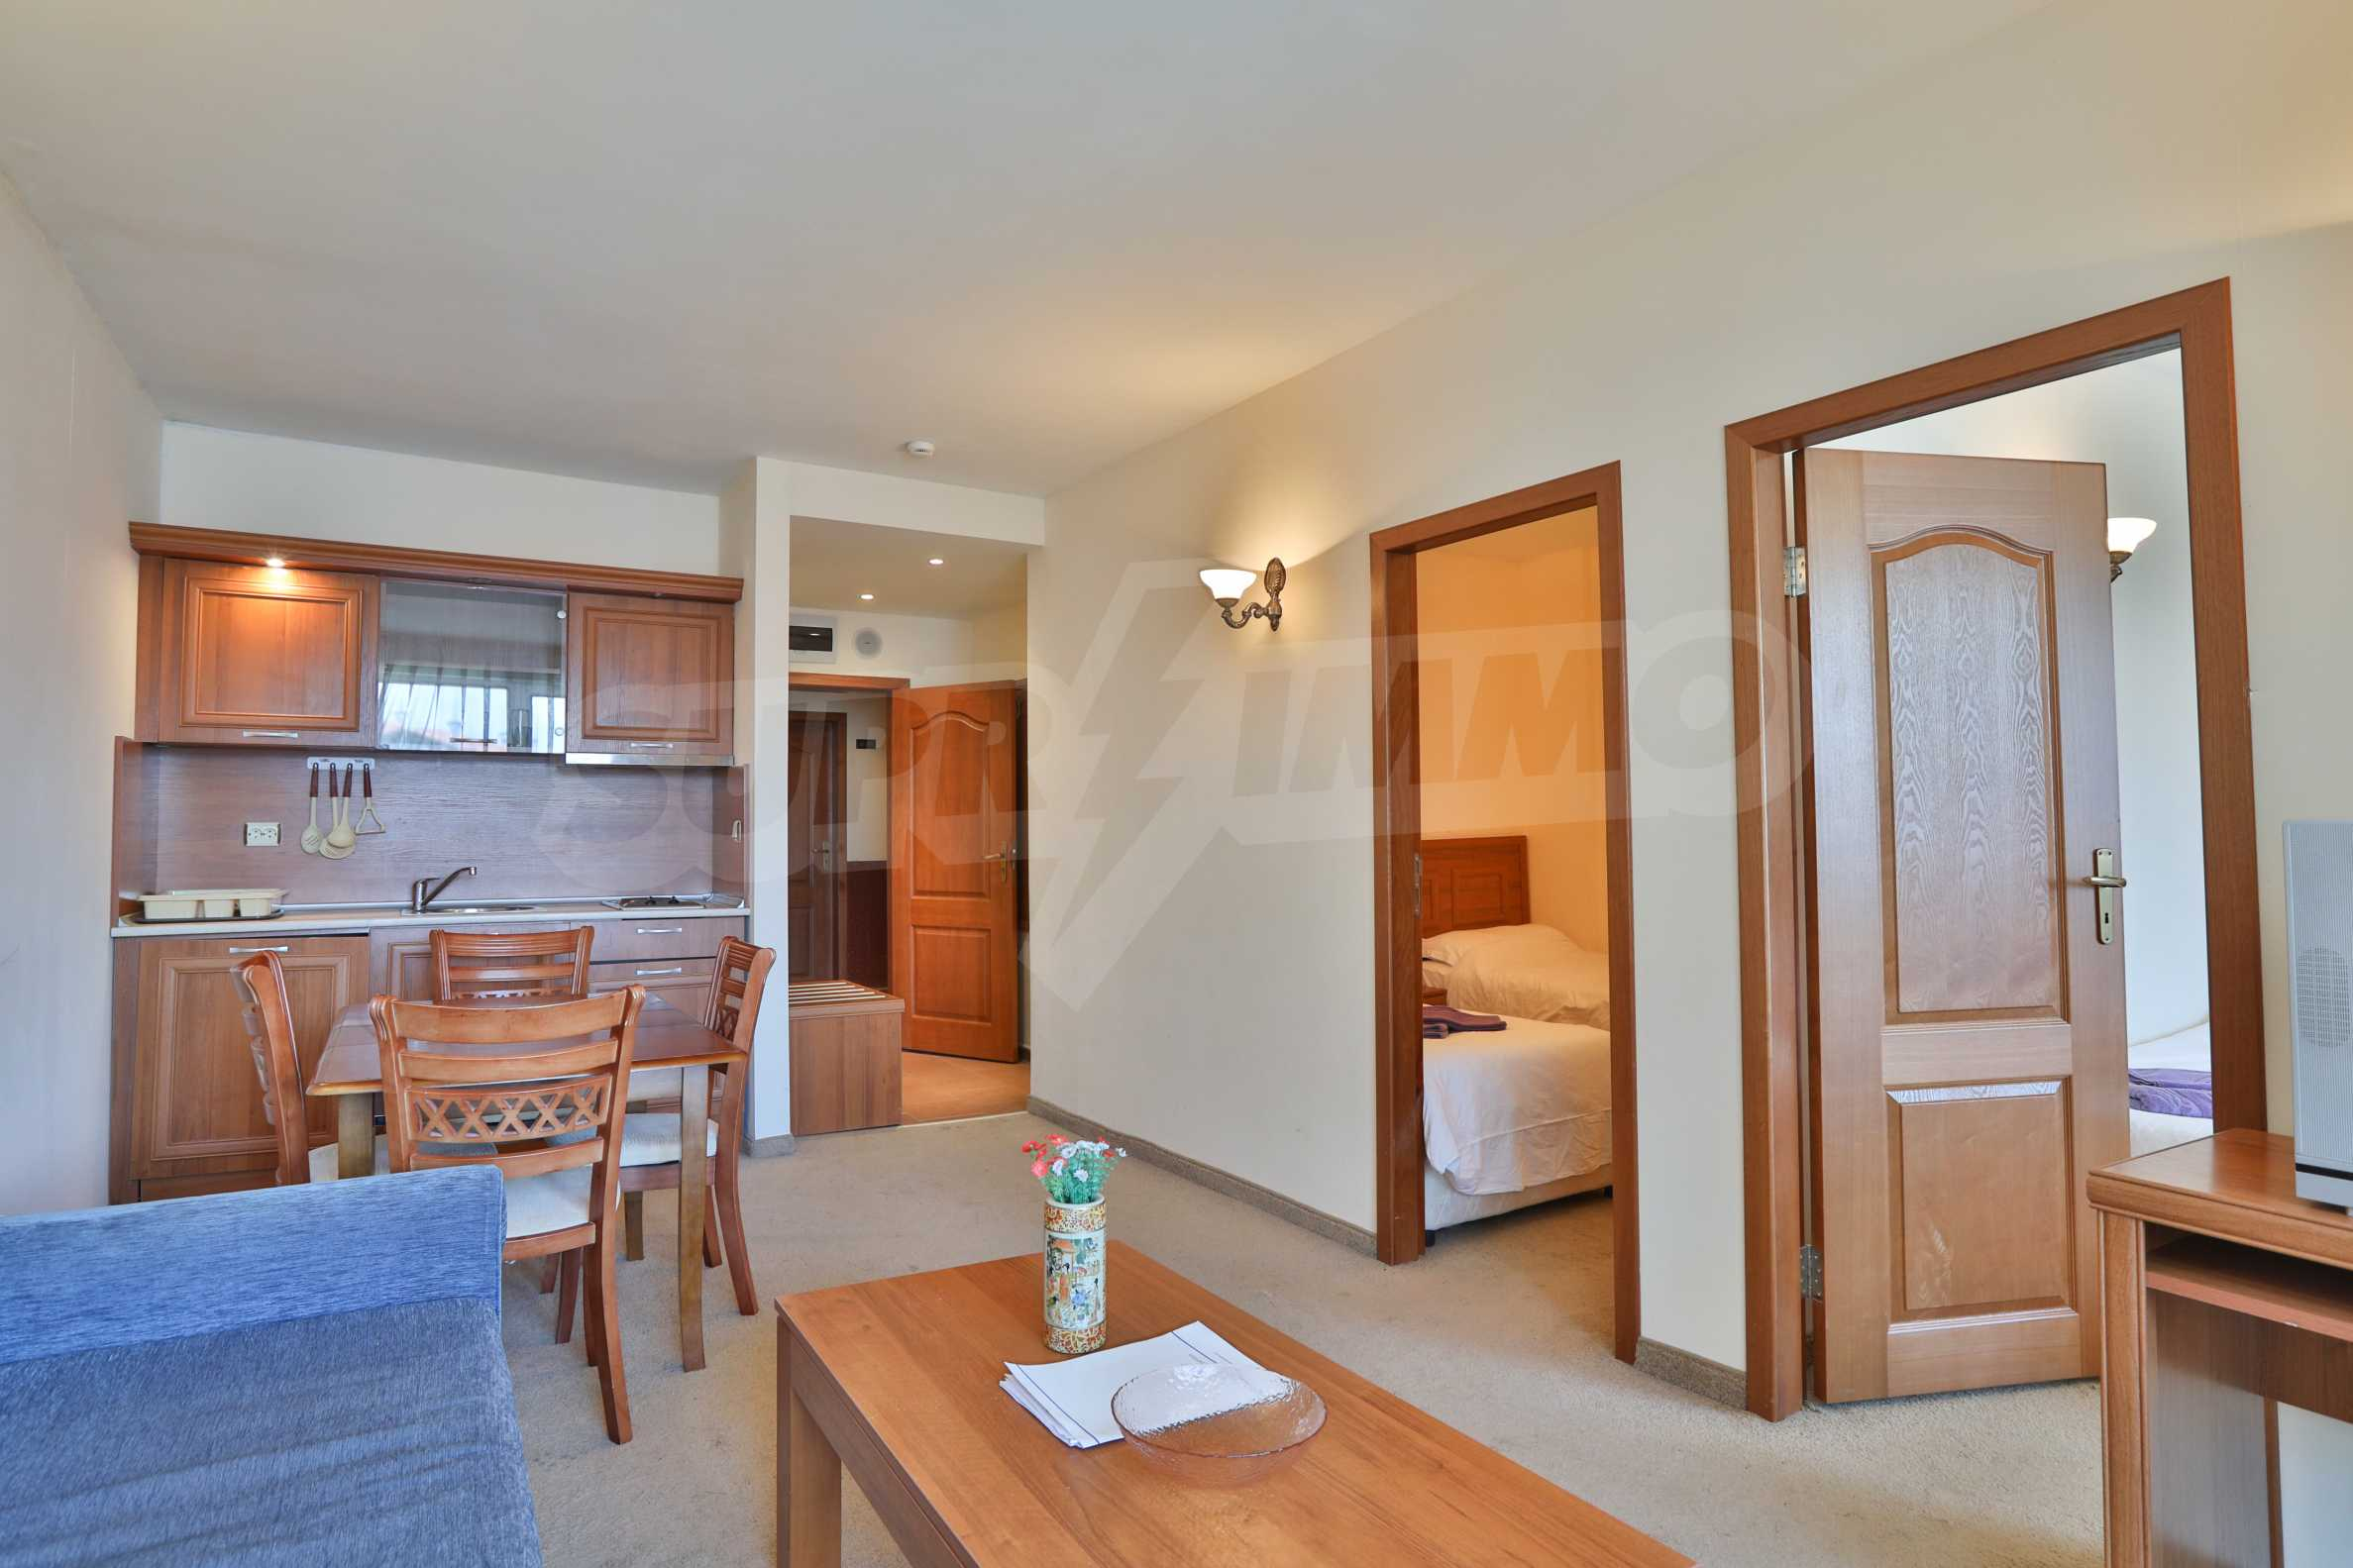 Просторен тристаен апартамент, намиращ се в комплекс Емералд в Банско 3